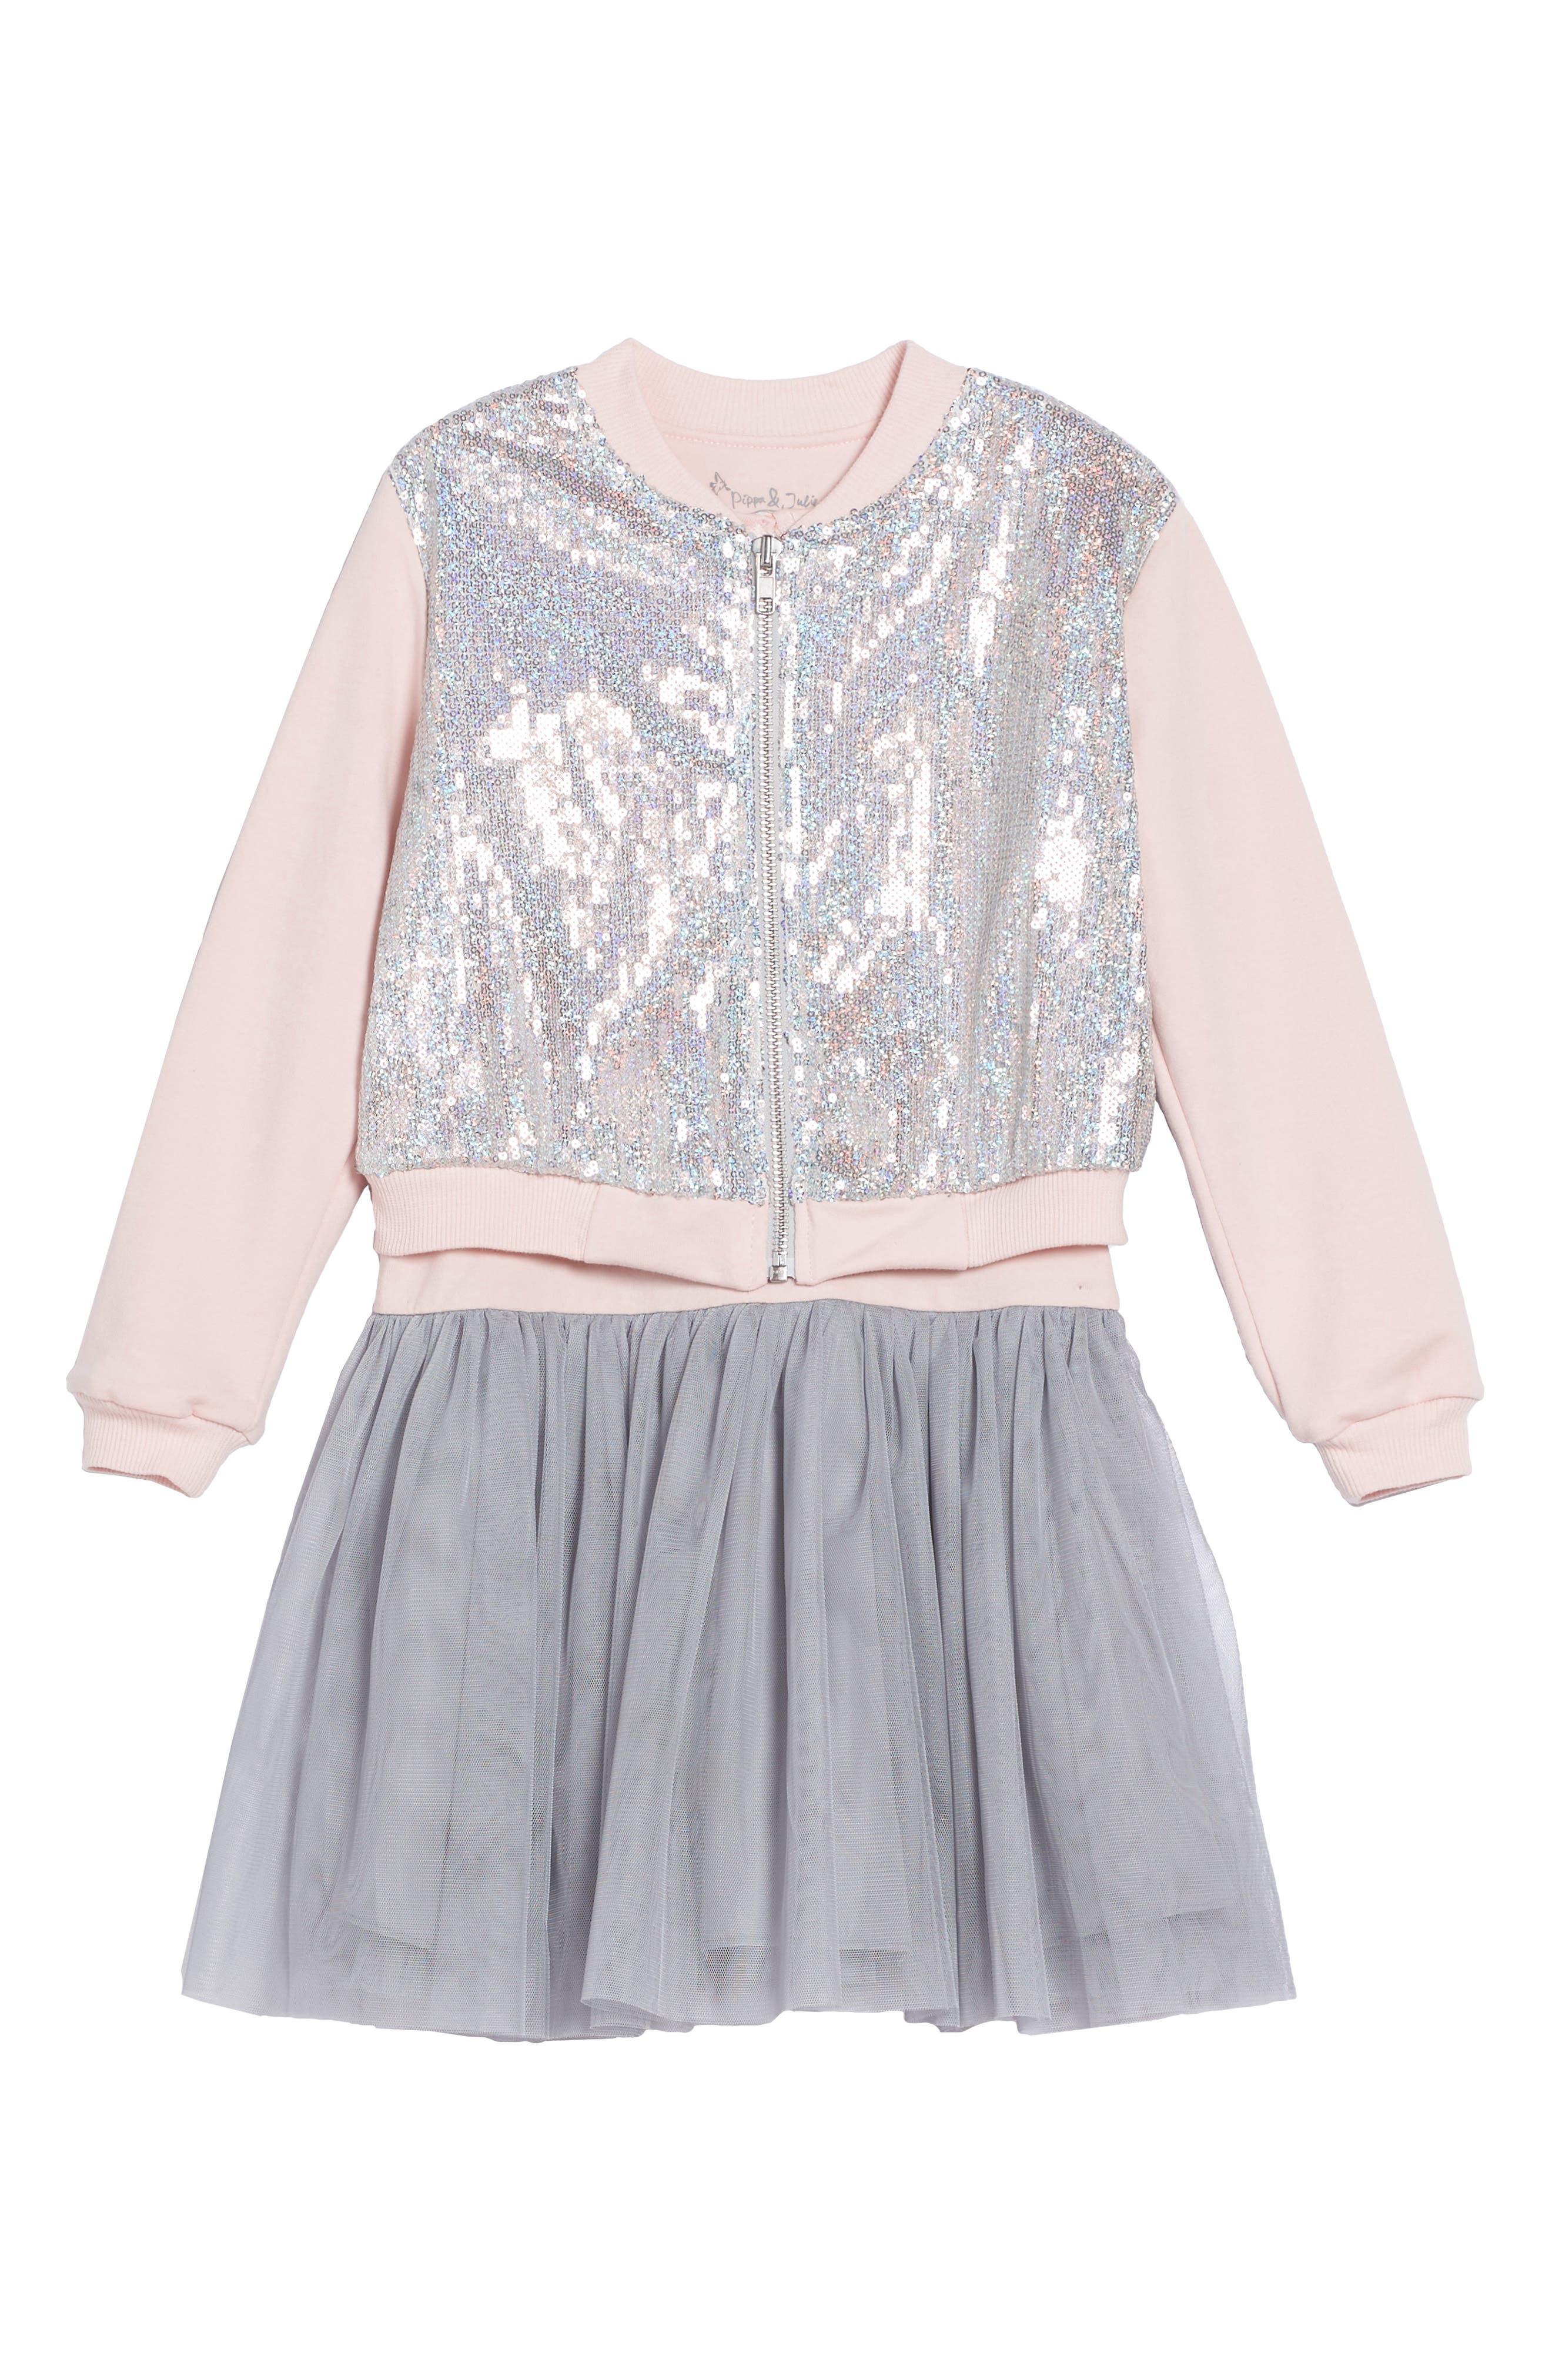 Alternate Image 1 Selected - Pippa & Julie Tank Dress & Sequin Bomber Jacket Set (Toddler Girls, Little Girls & Big Girls)